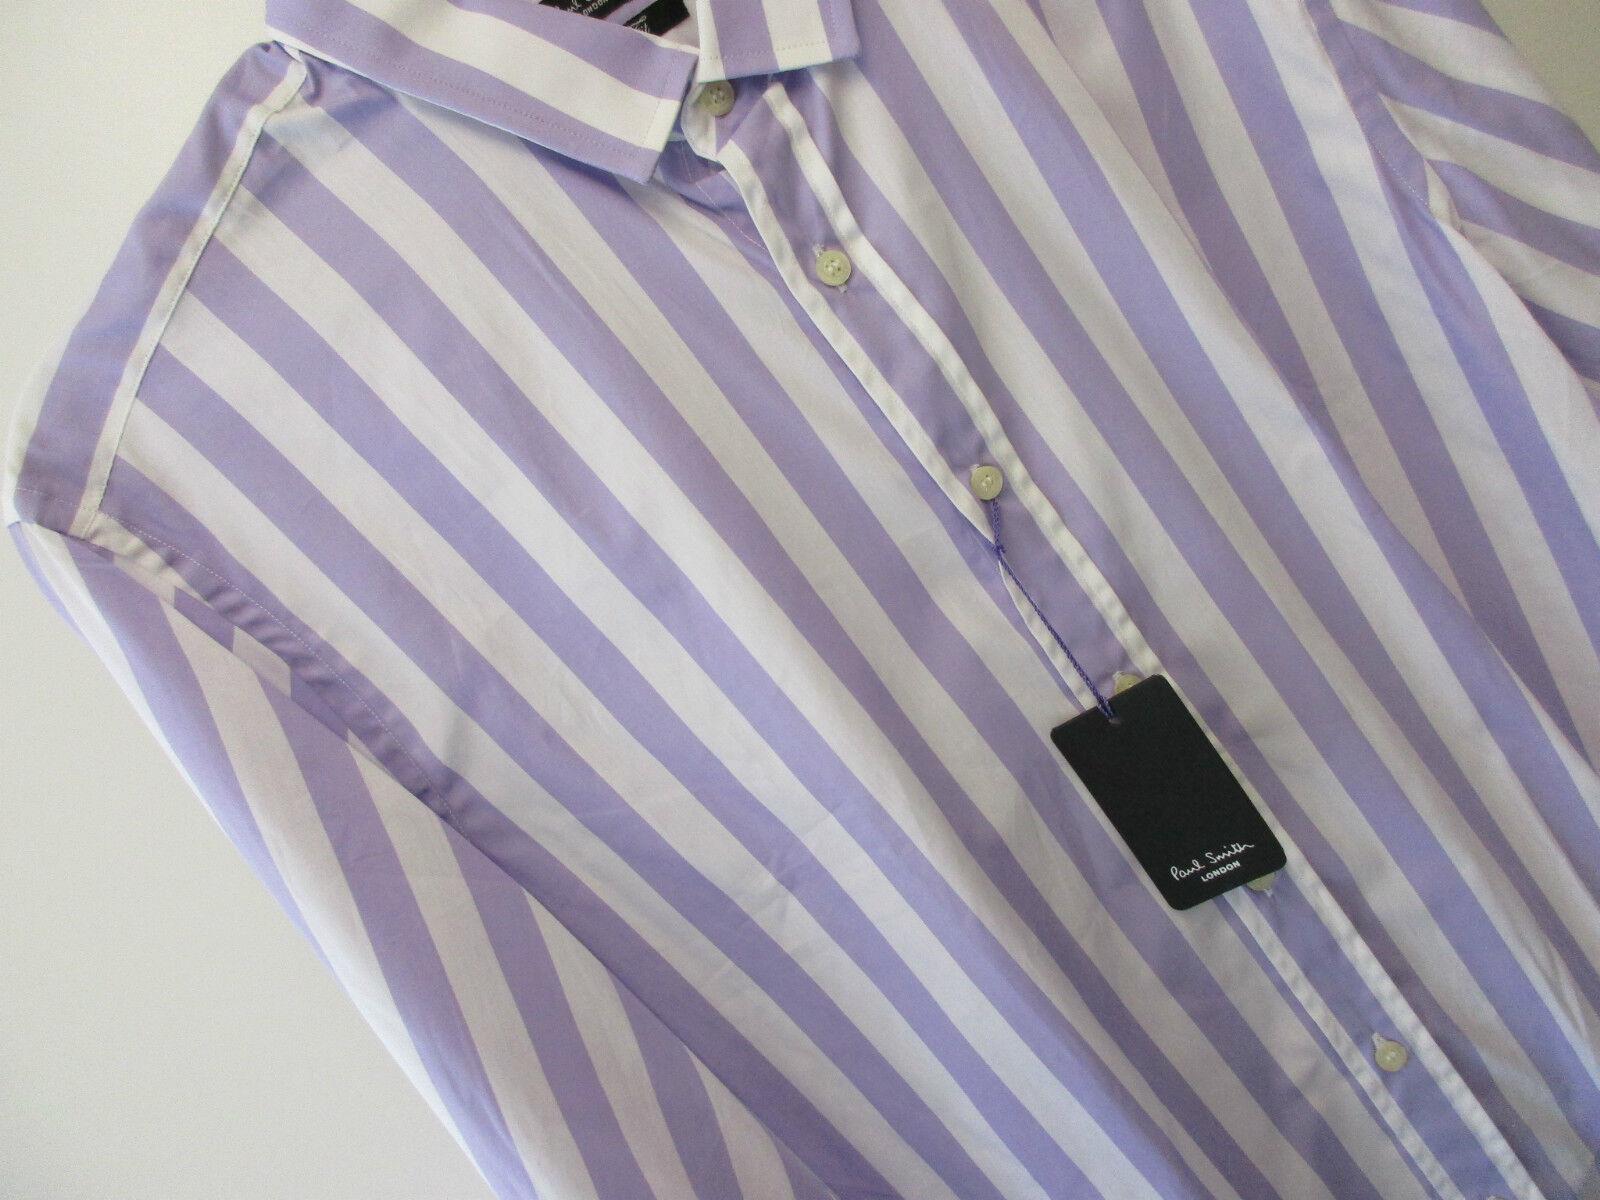 Paul Smith Camicia Formale Slim Fit 16  EU41 Londra Mauve candy-stripe RRP